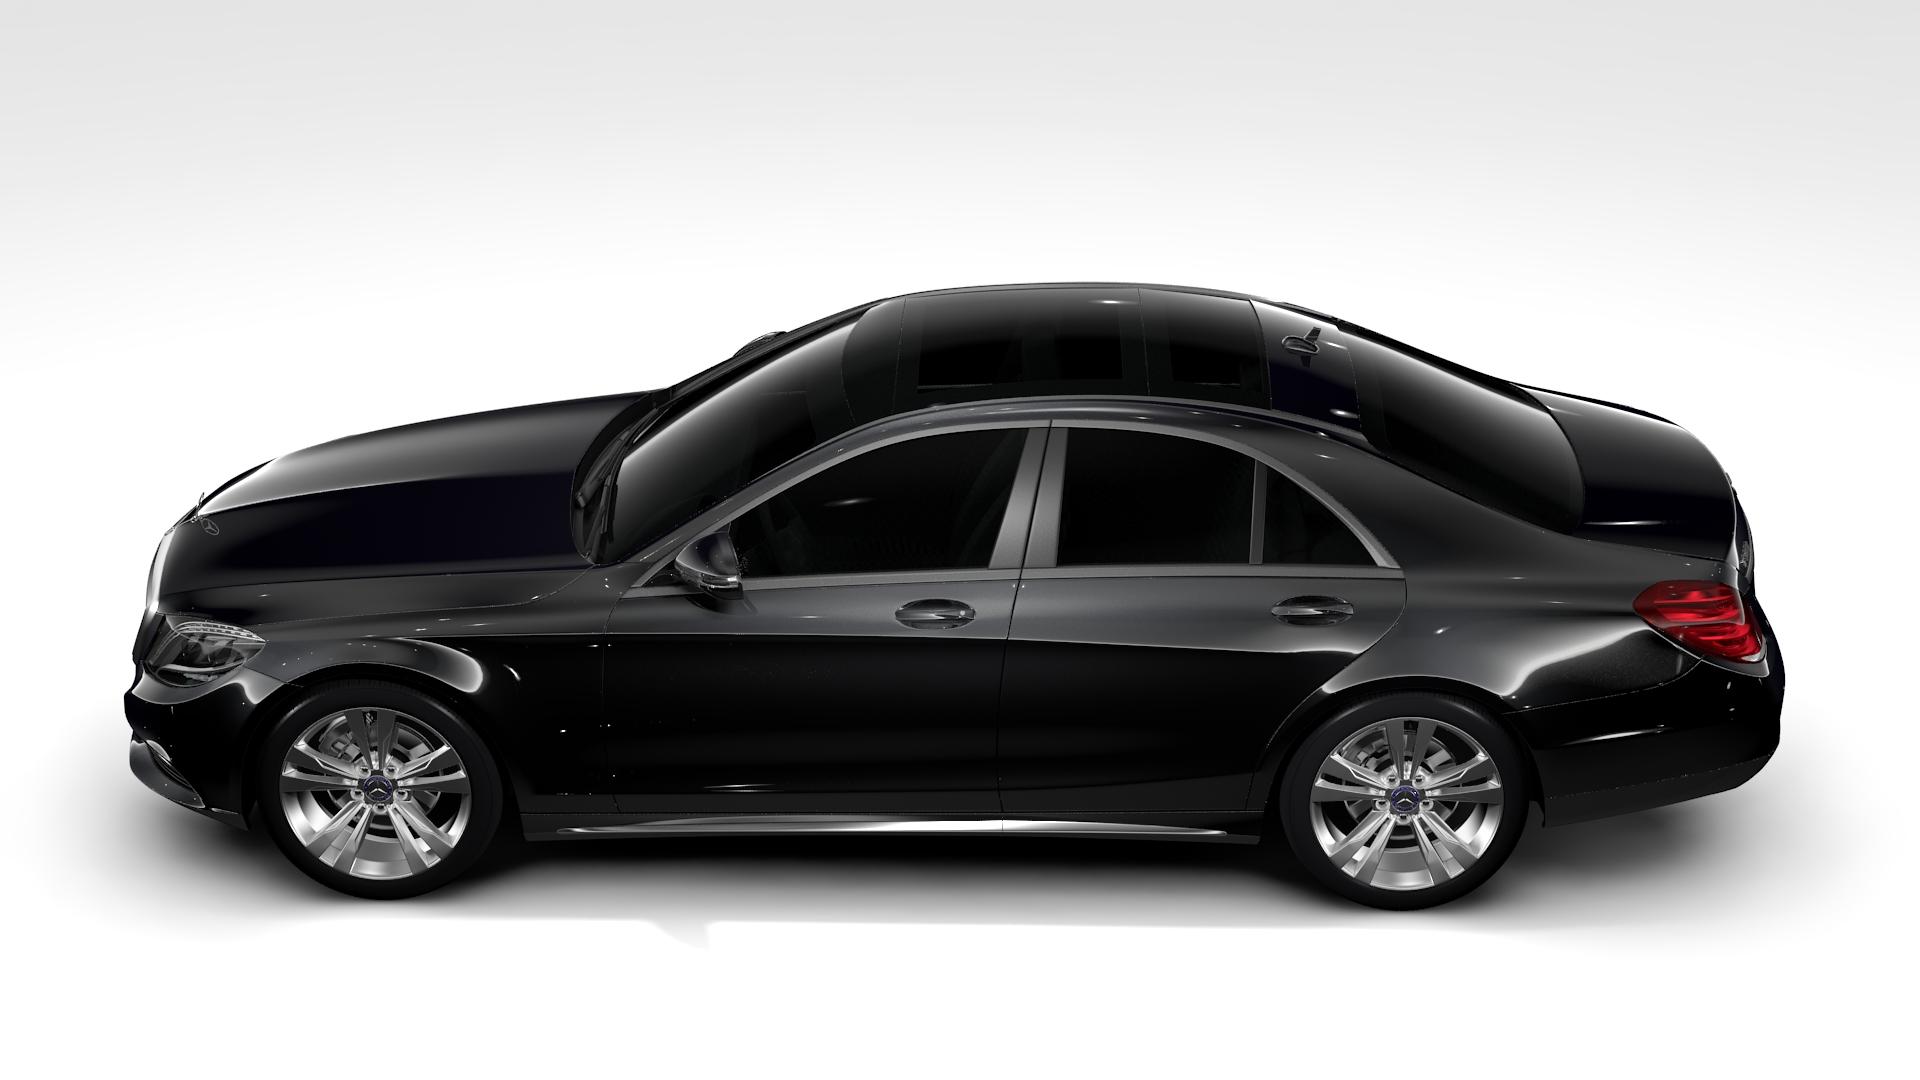 Mercedes benz s 300 bluetec hybrid w222 2016 3d model for Mercedes benz hybrid car